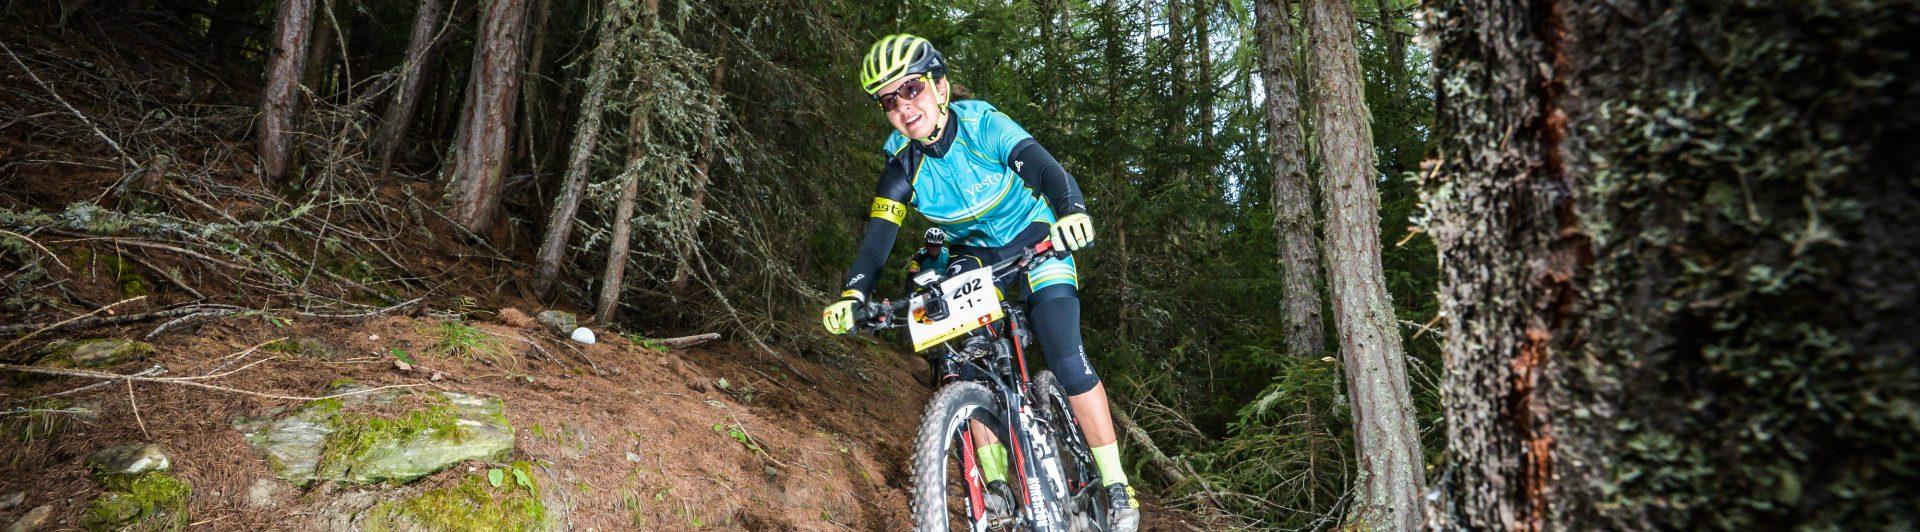 Iron-Bike Race – End of Season 2017